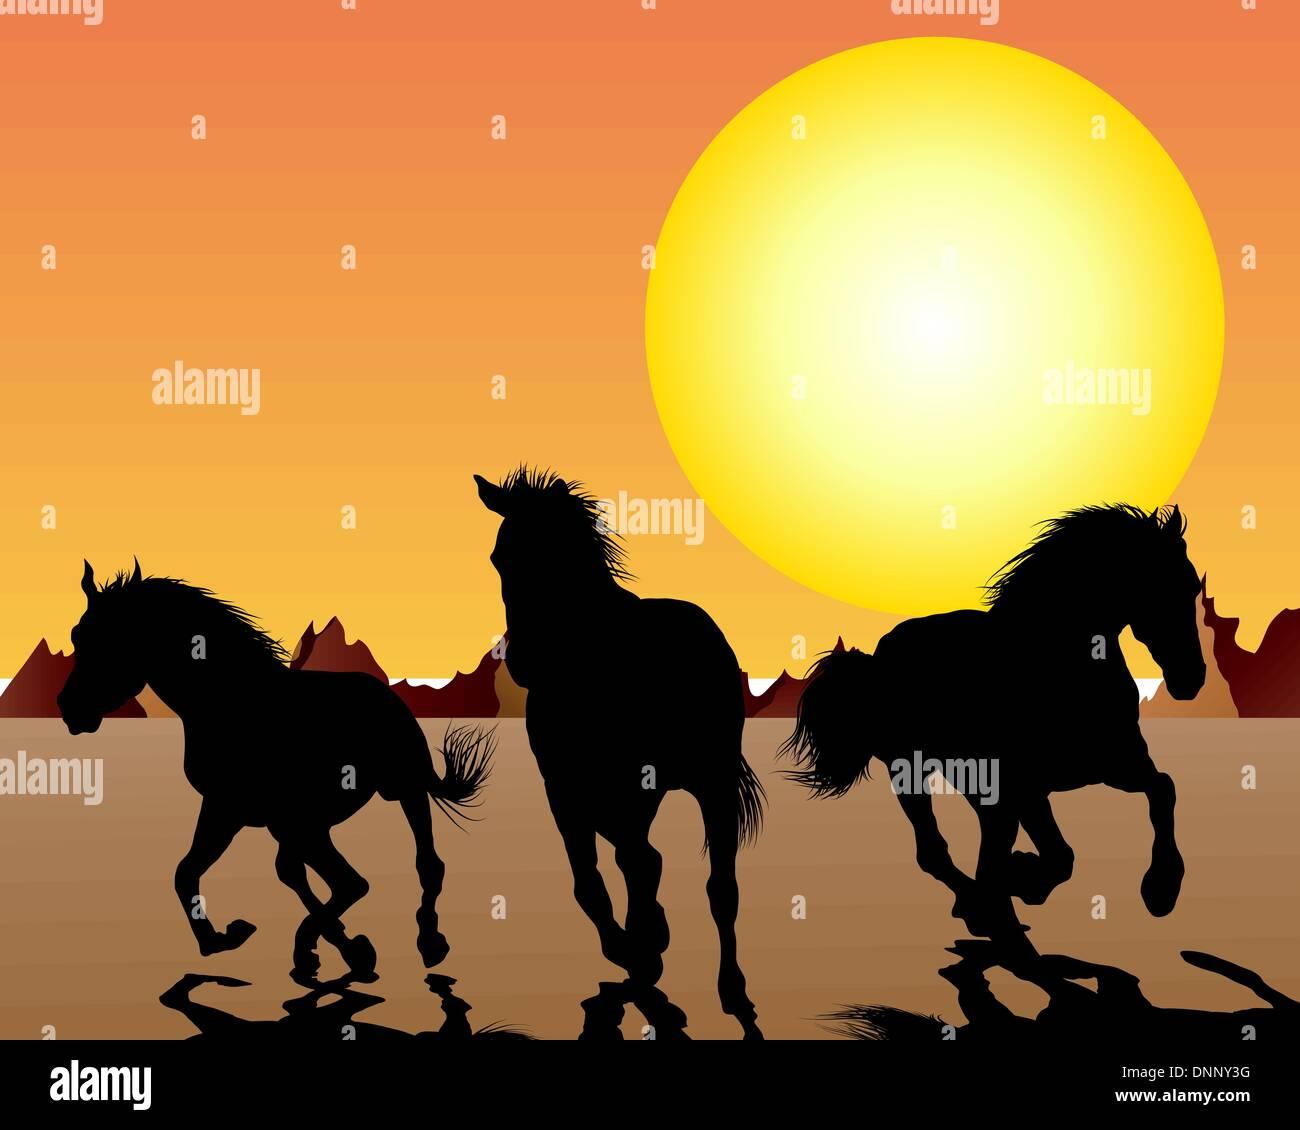 Horse Silhouette On Sunset Background Vector Illustration Stock Vector Image Art Alamy